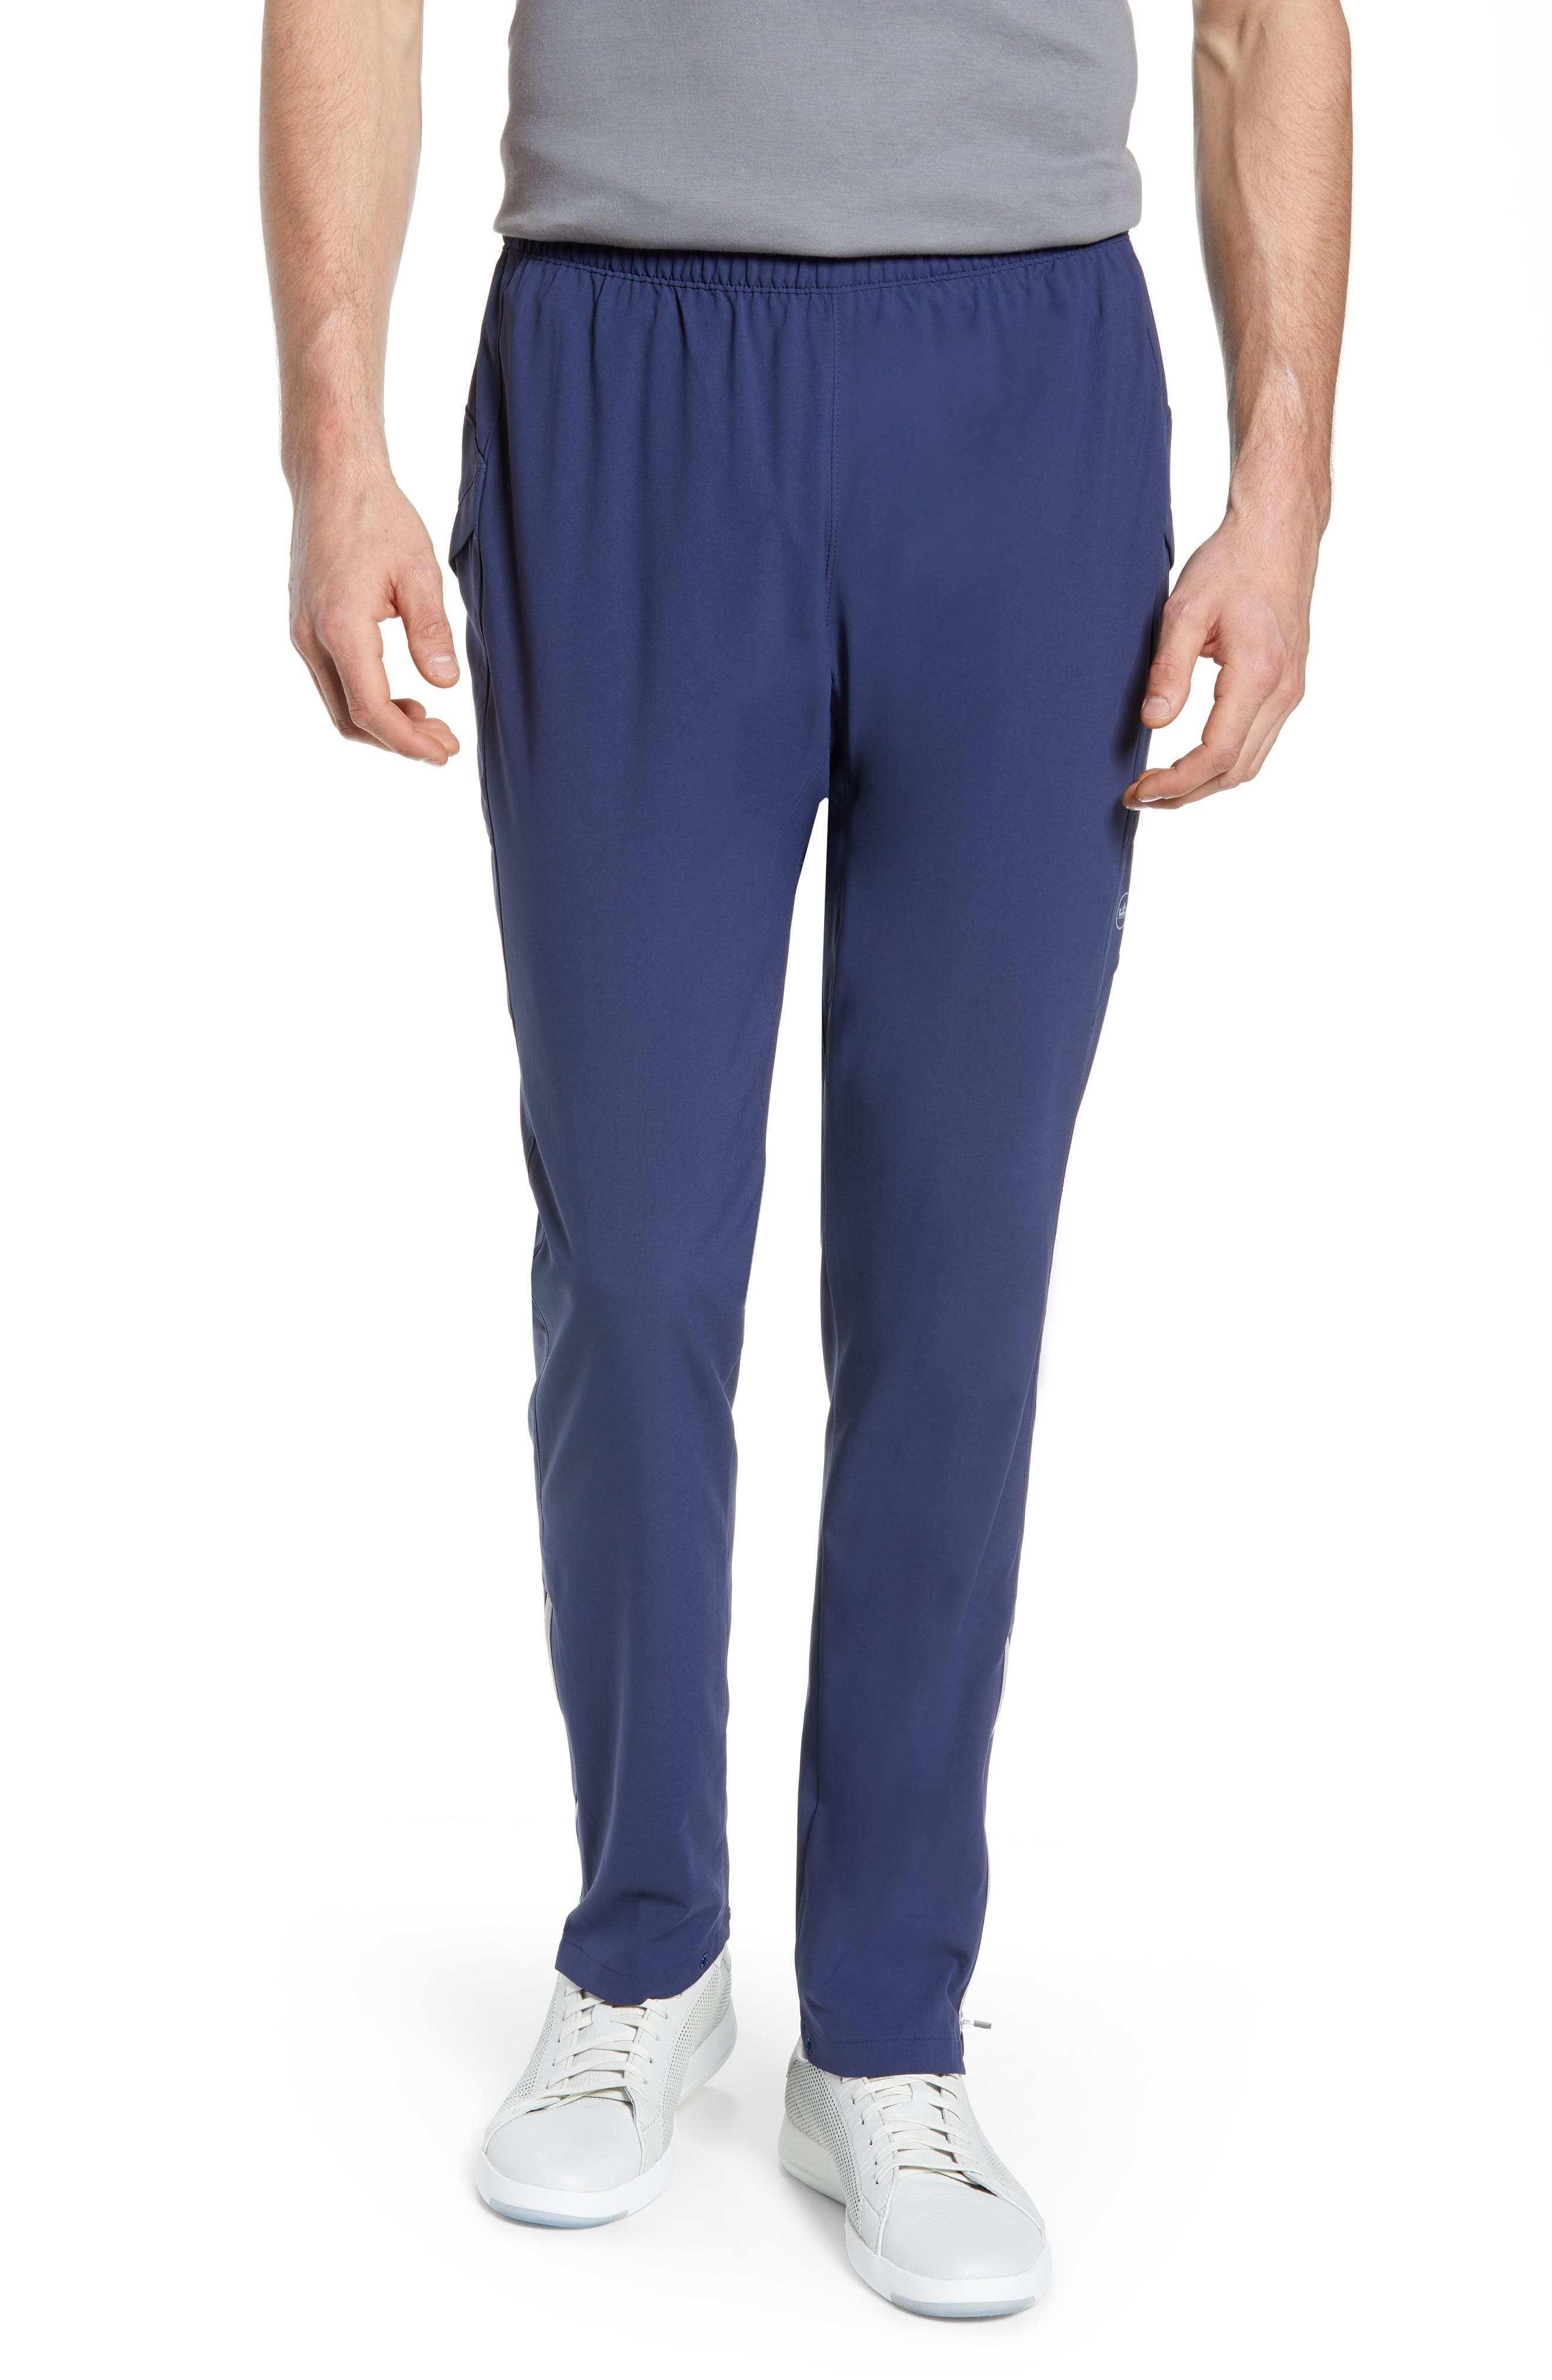 Peter Millar Vancouver Action Training Pants, Blue